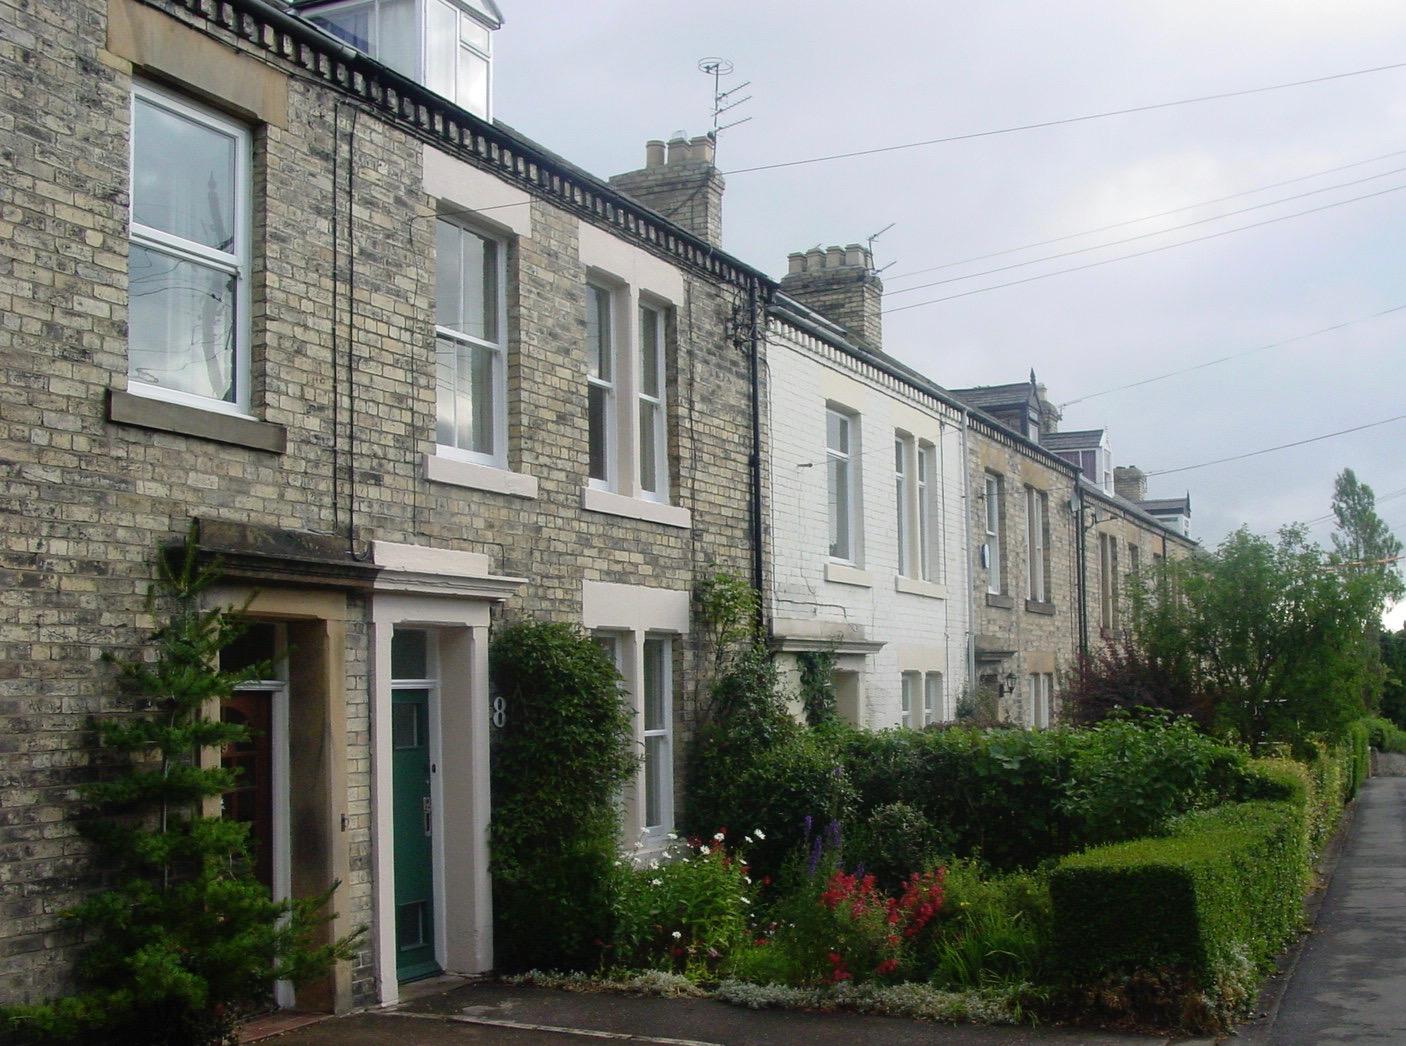 Ryton cottages, Durham